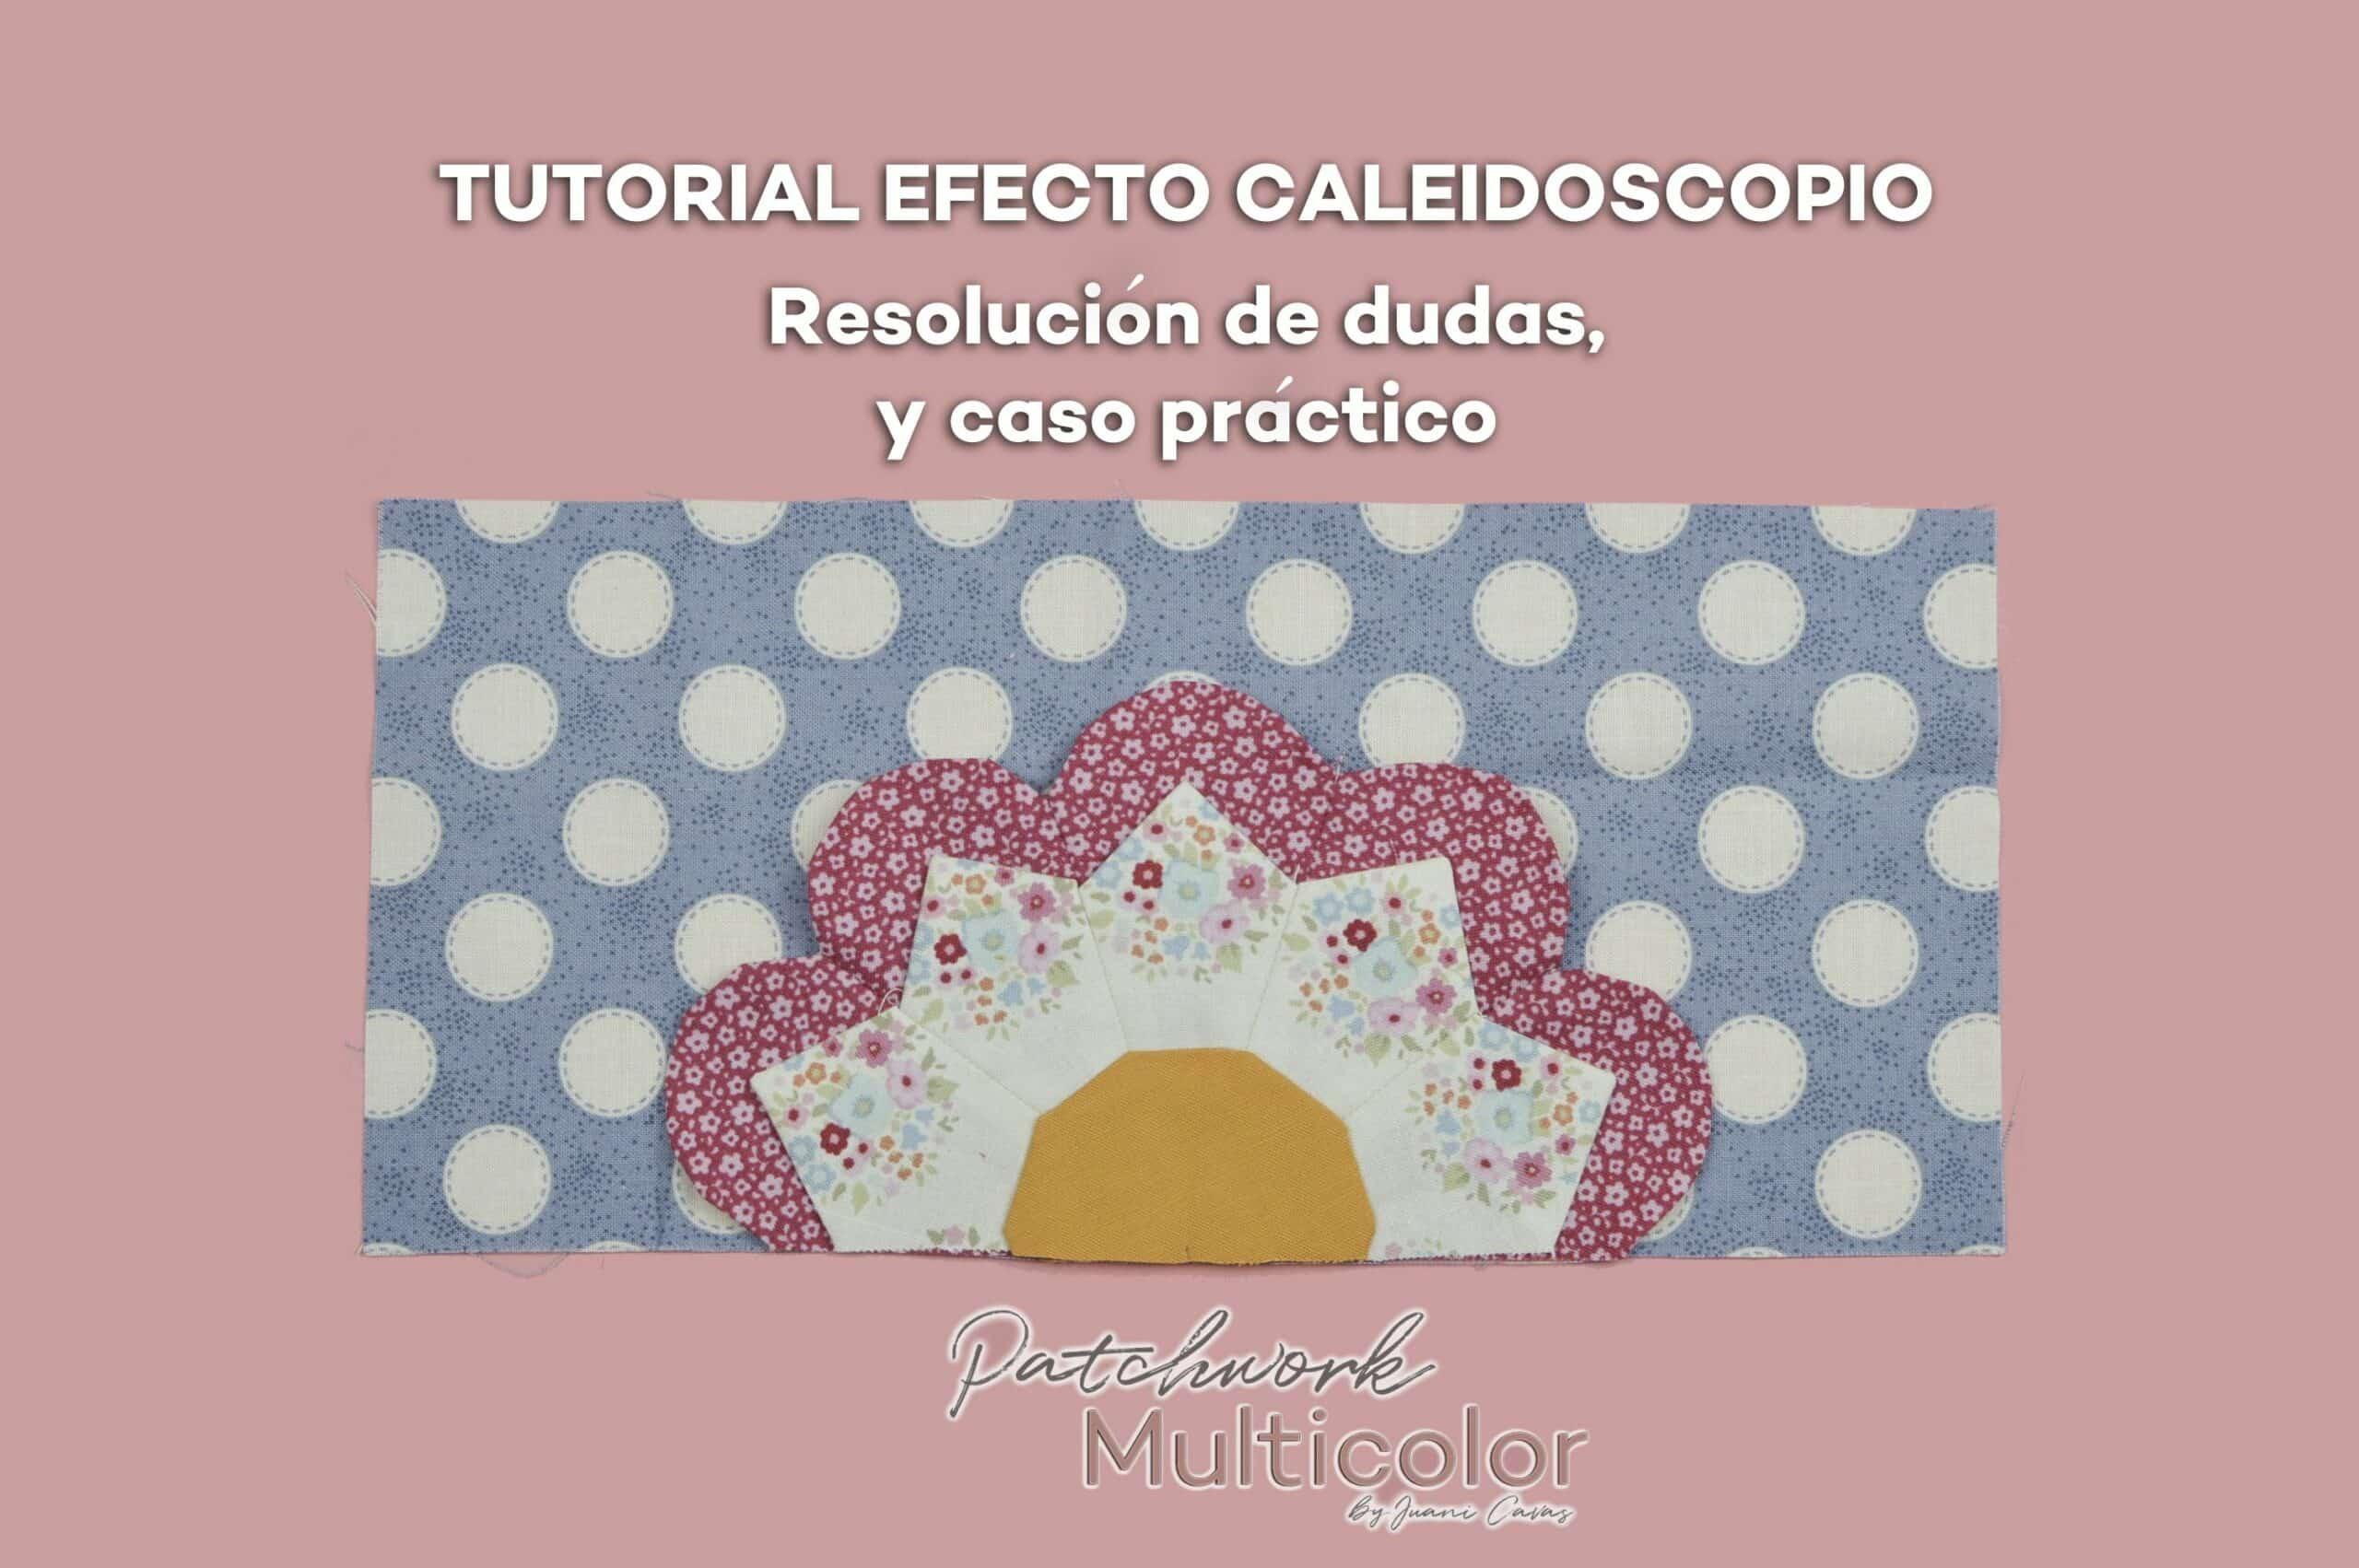 tutorial caleidoscopio patchwork